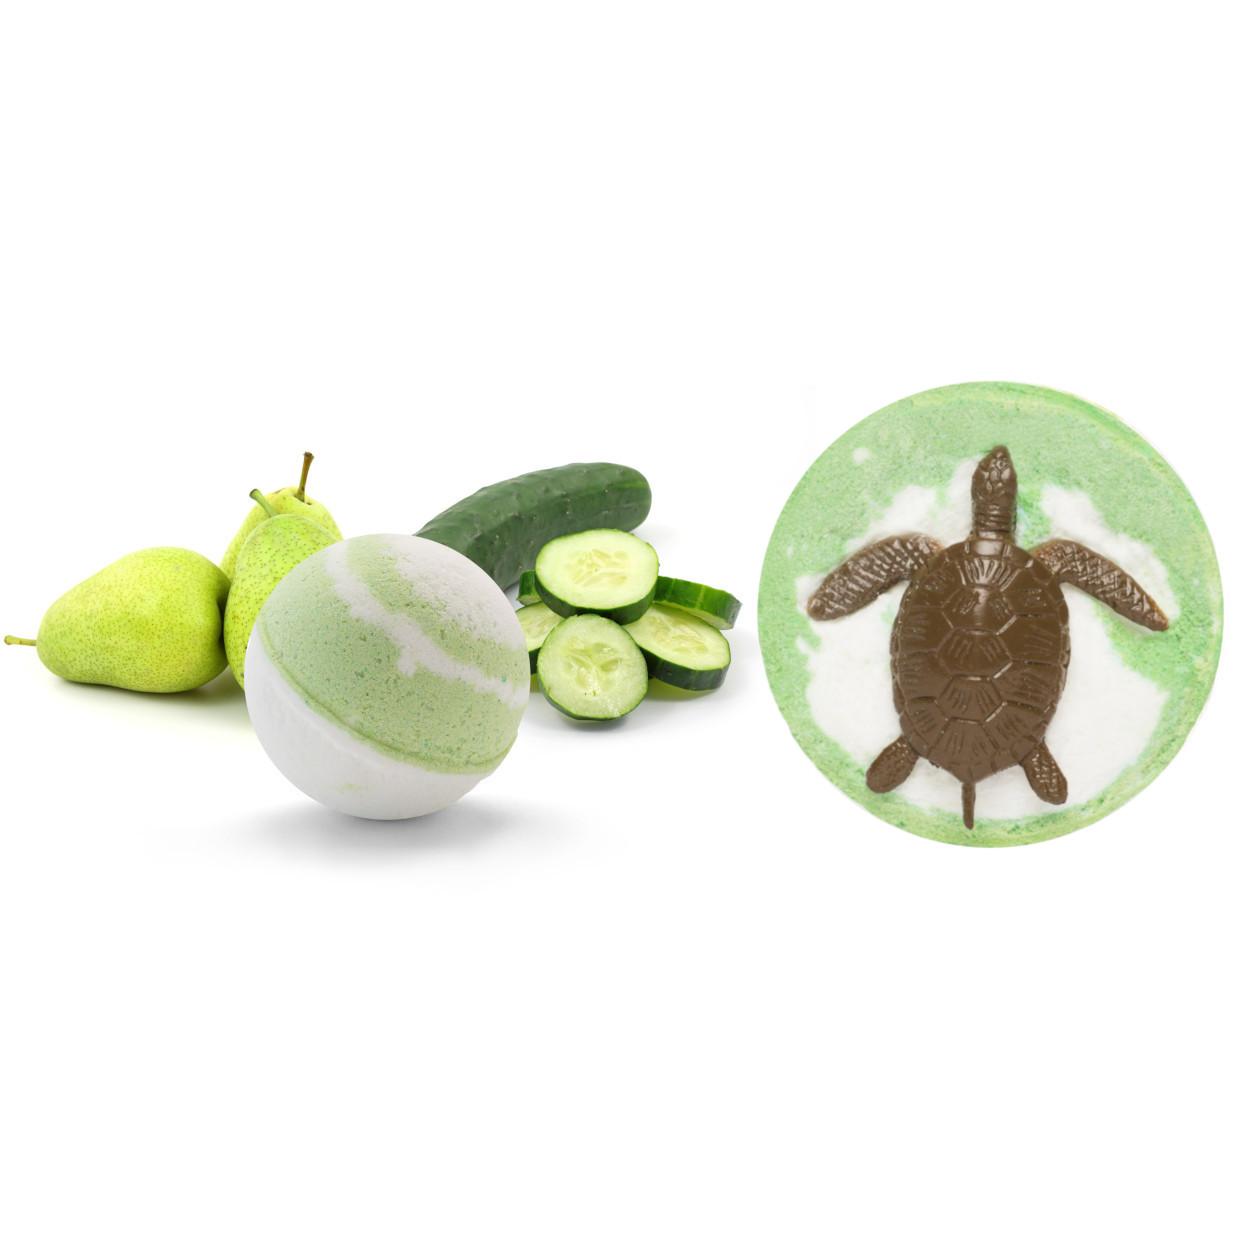 cucumber-pear-turtle-square